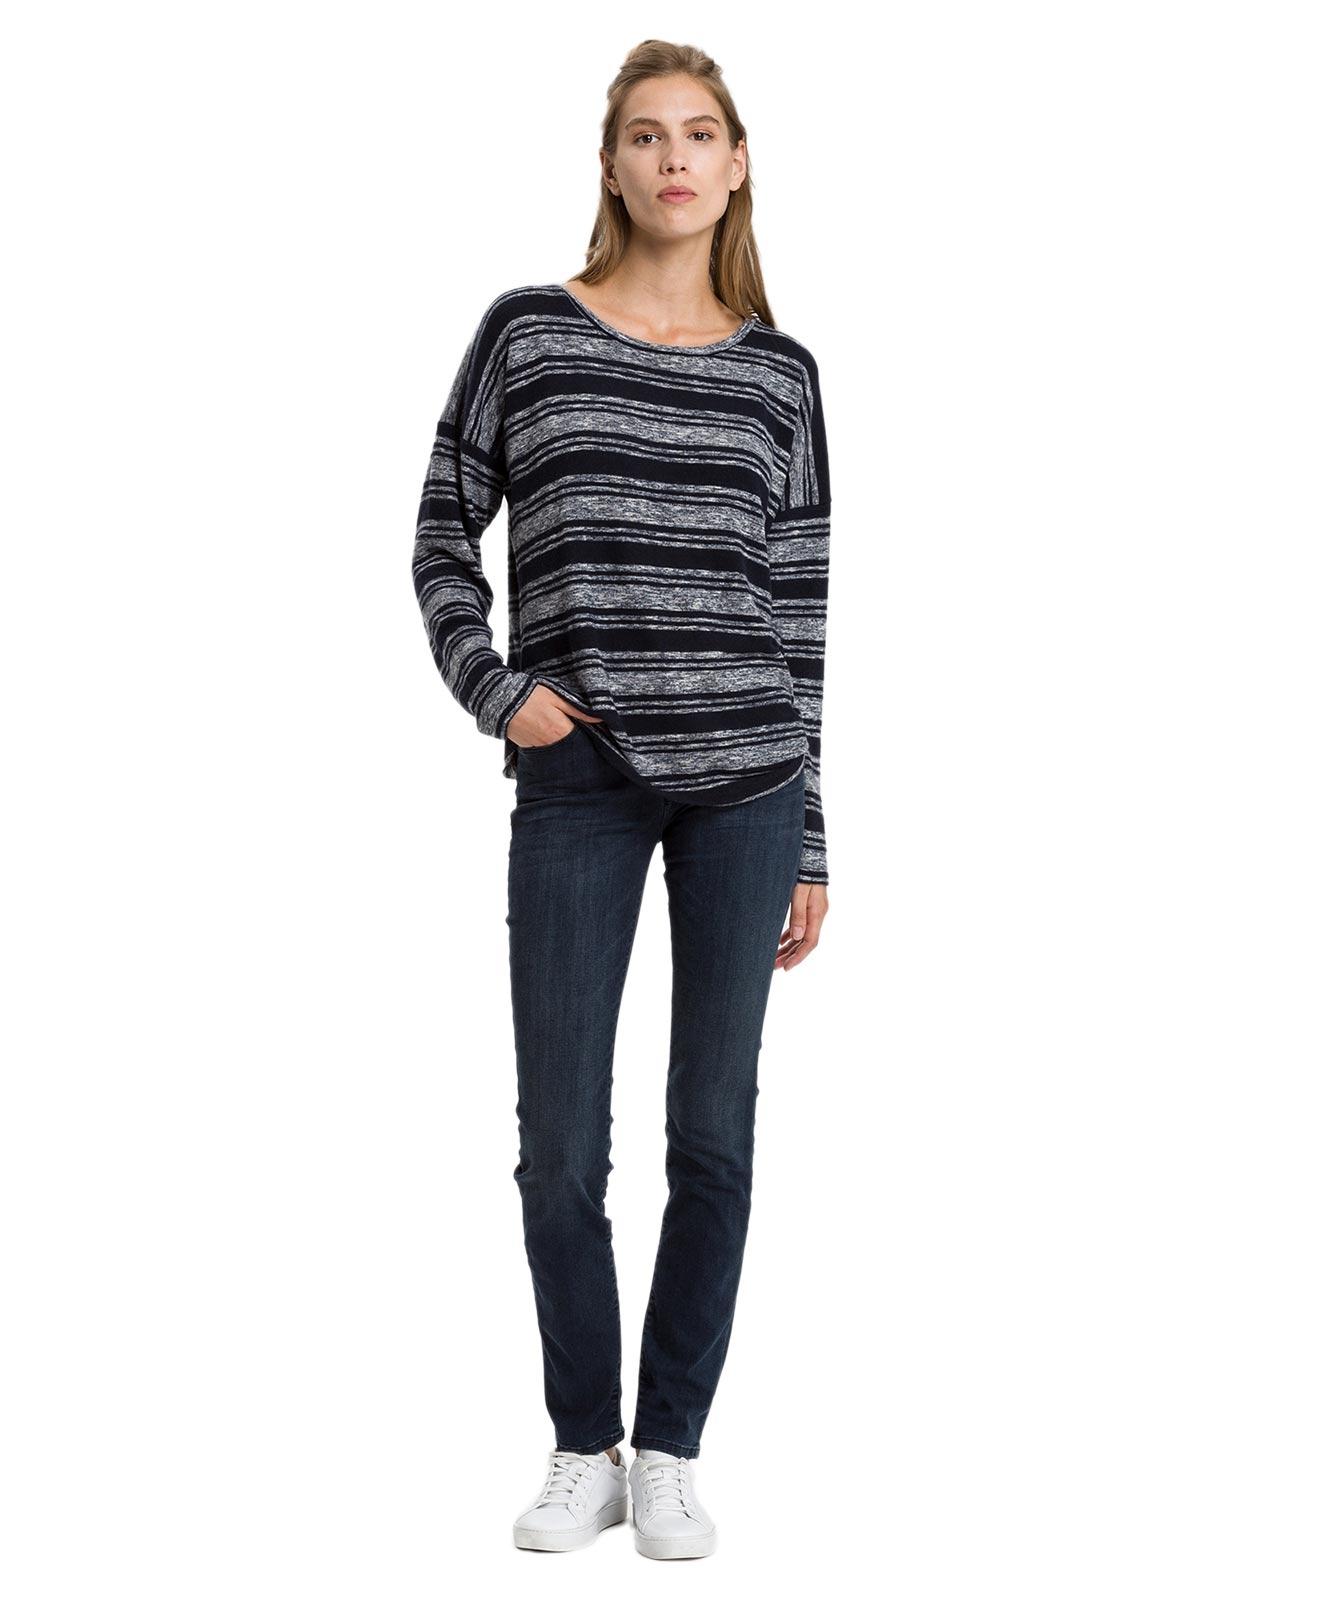 Hosen - Cross Mom Jeans Anya in Blue Black  - Onlineshop Jeans Meile